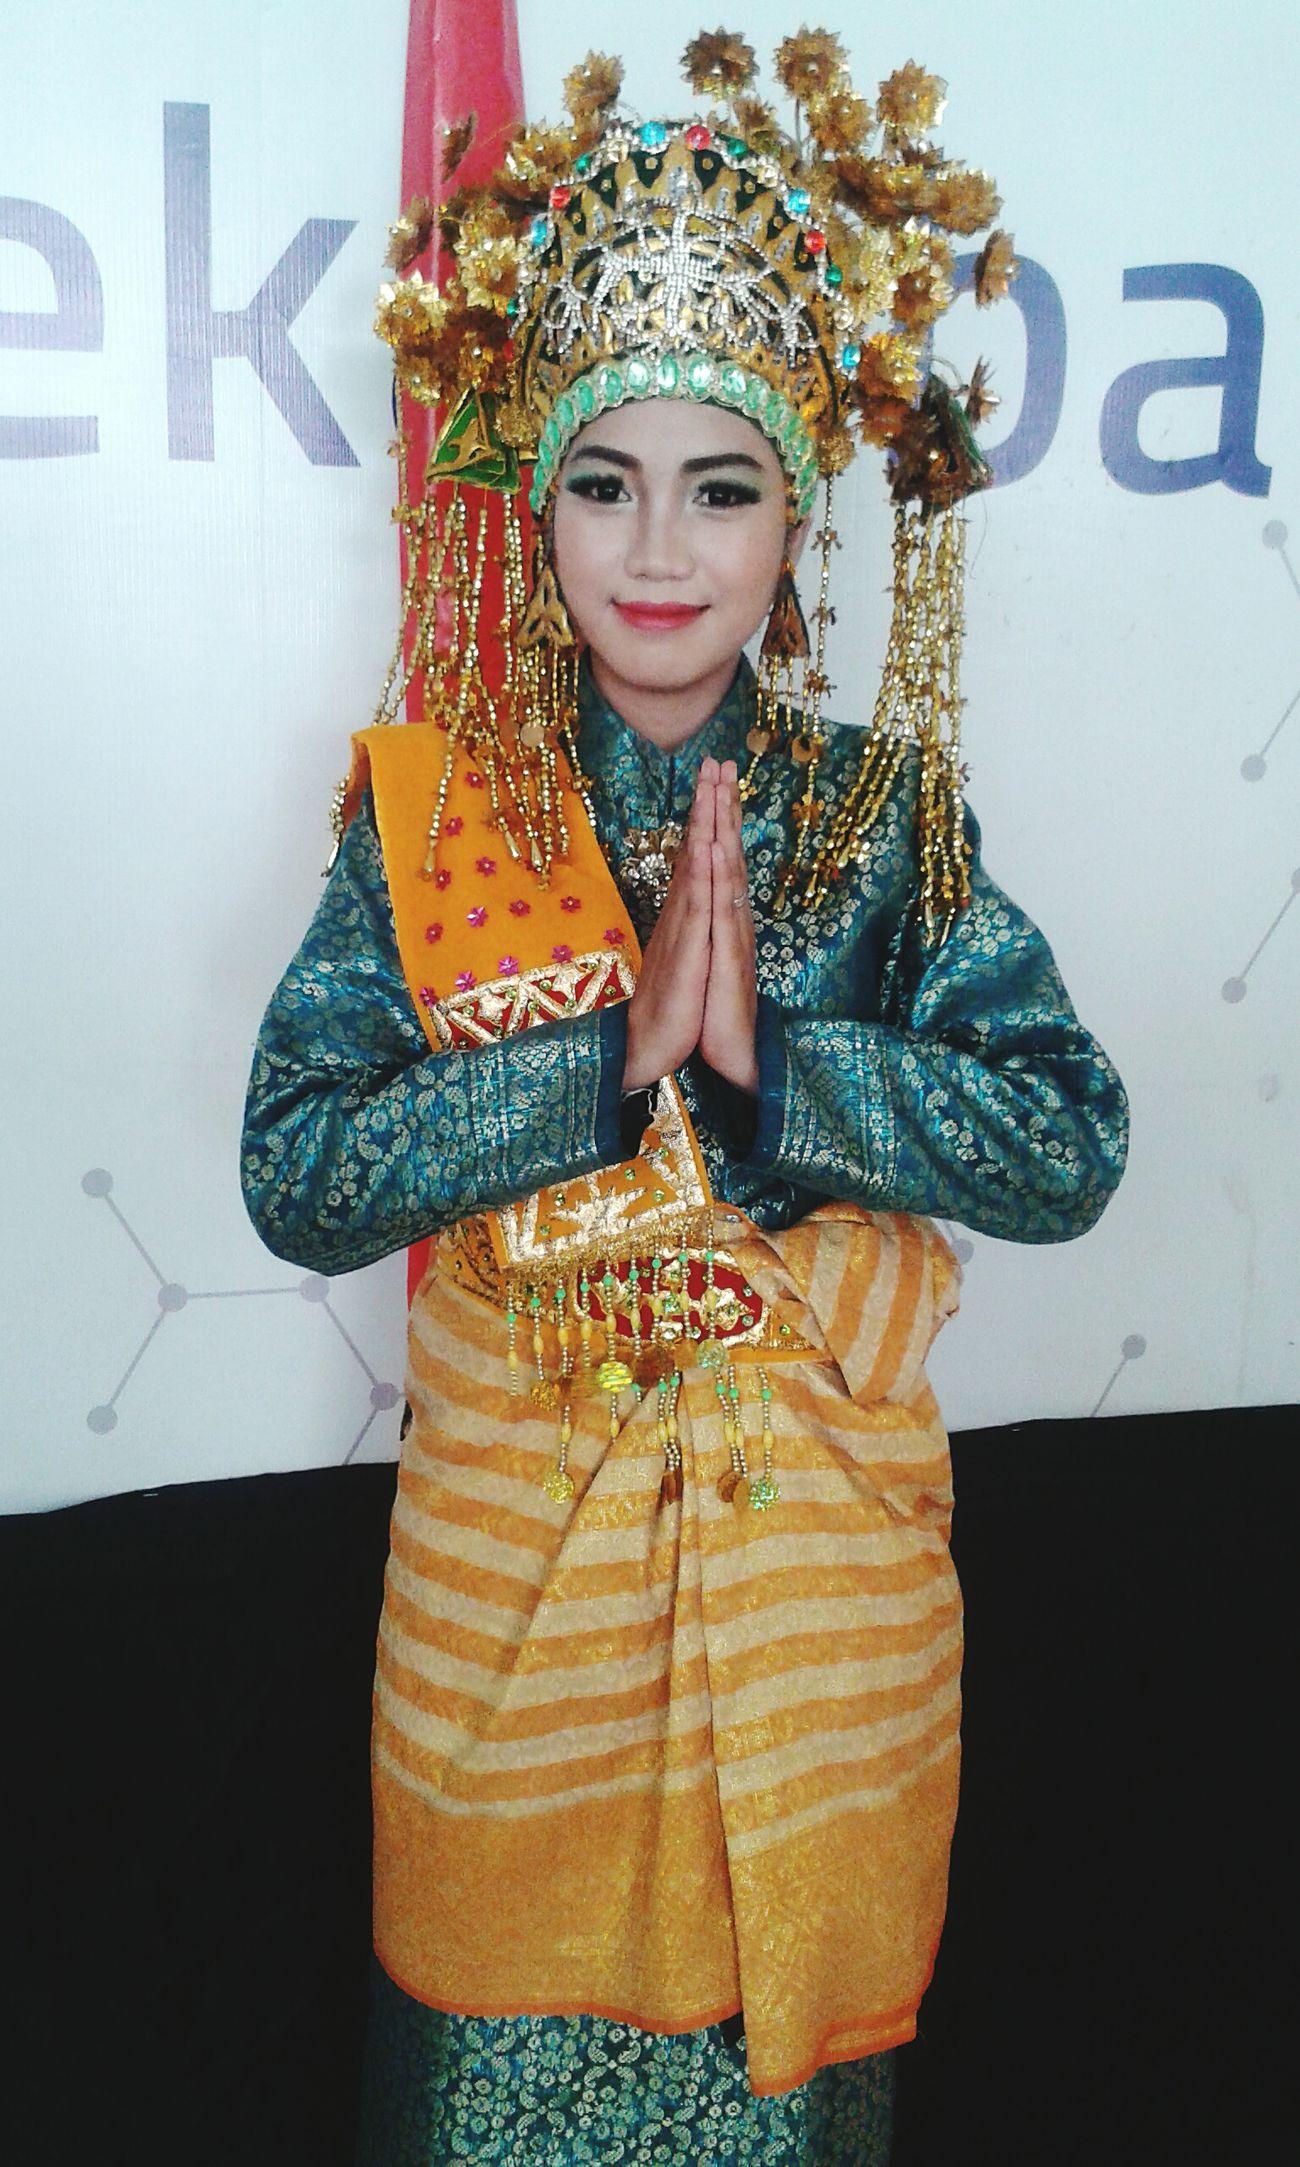 Tari Persembahan Tradisional Dance Etnic Sunting Melayu Melayu Riau Iloveindonesia Explore Exploreindonesia Exploreriau EyeEm Best Shots